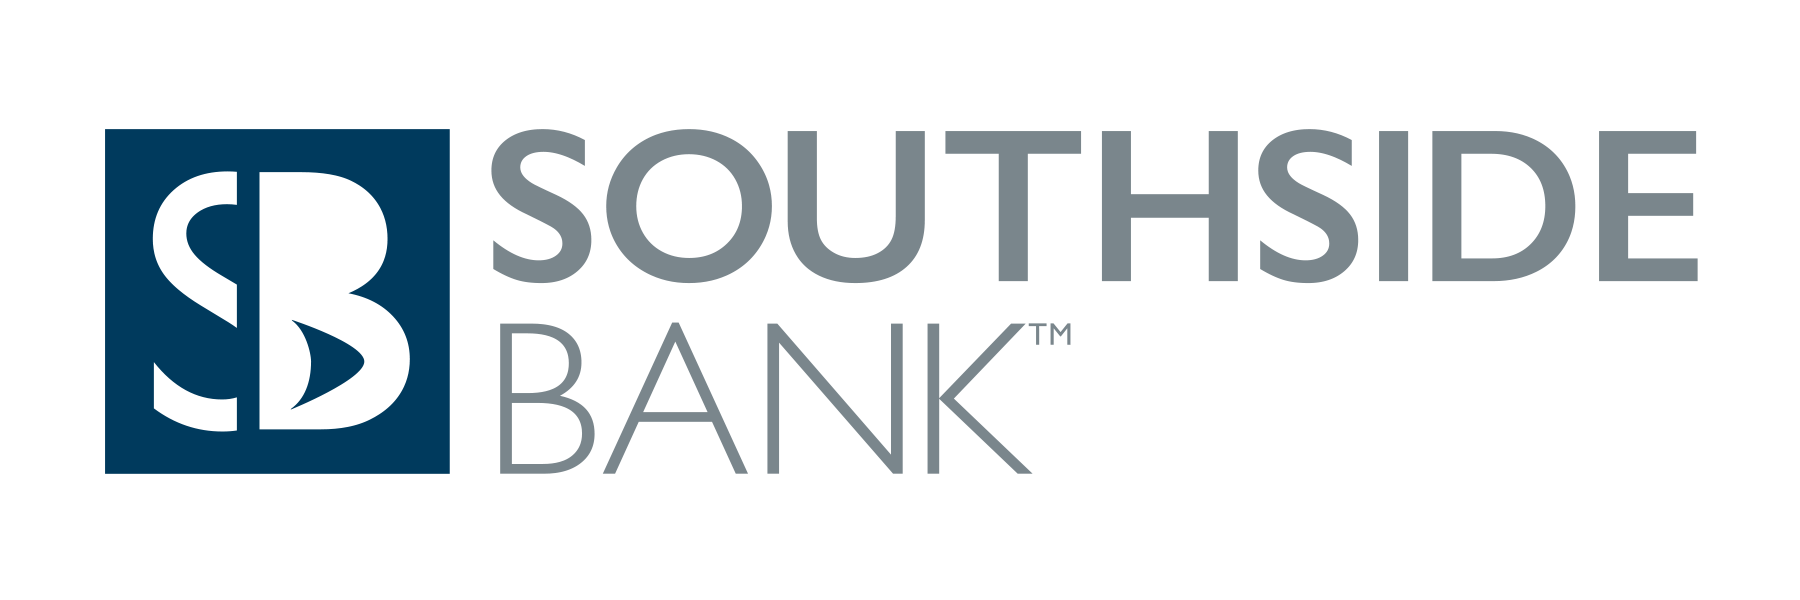 SouthsideBank Primary Horizontal Color